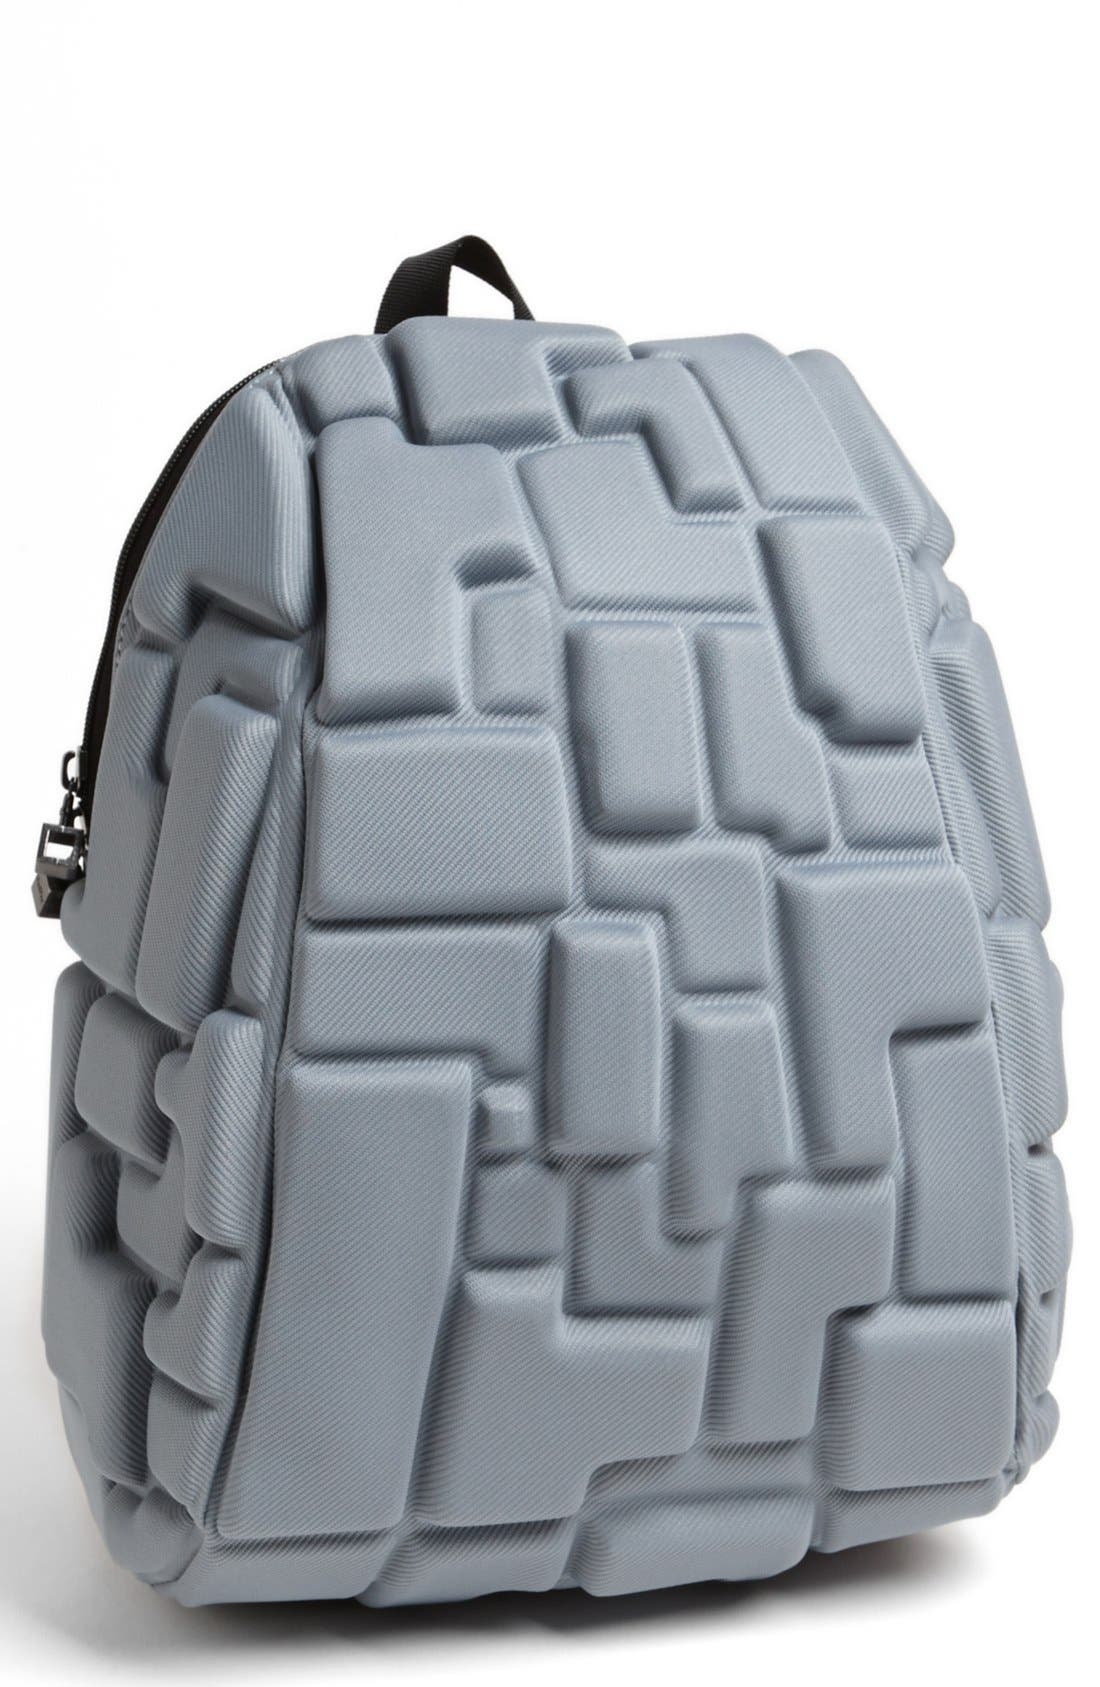 Alternate Image 1 Selected - MadPax 'The Blok' Half-Pack Backpack (Toddler Boys & Little Boys)